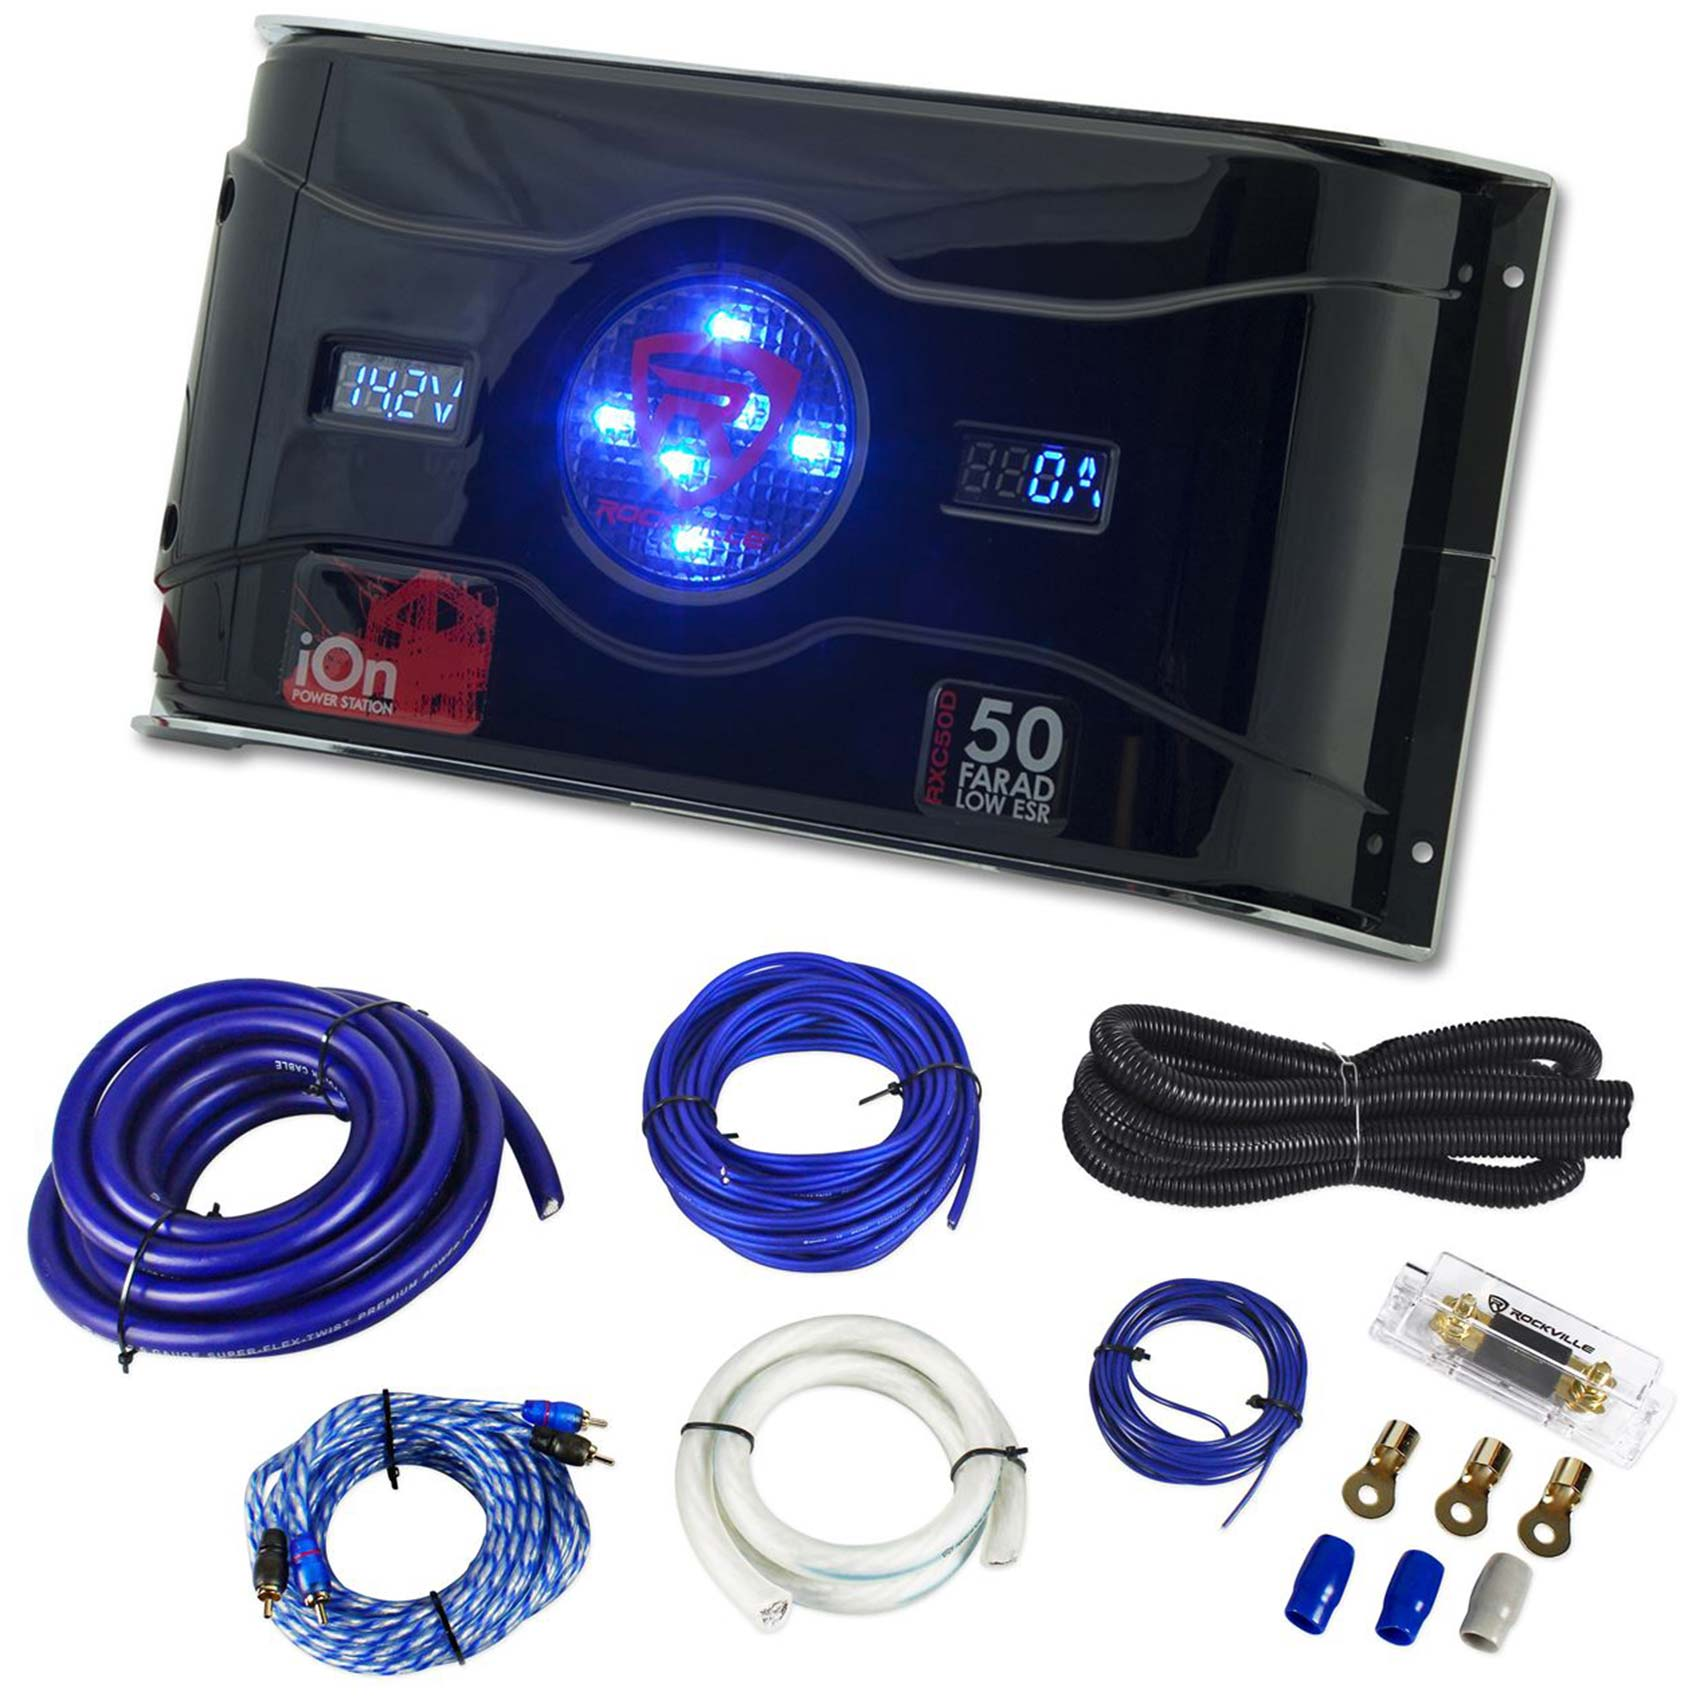 medium resolution of rockville 50 farad hybrid led car capacitor w dual meters 0 gauge amp wire kit car amp wiring kit walmart